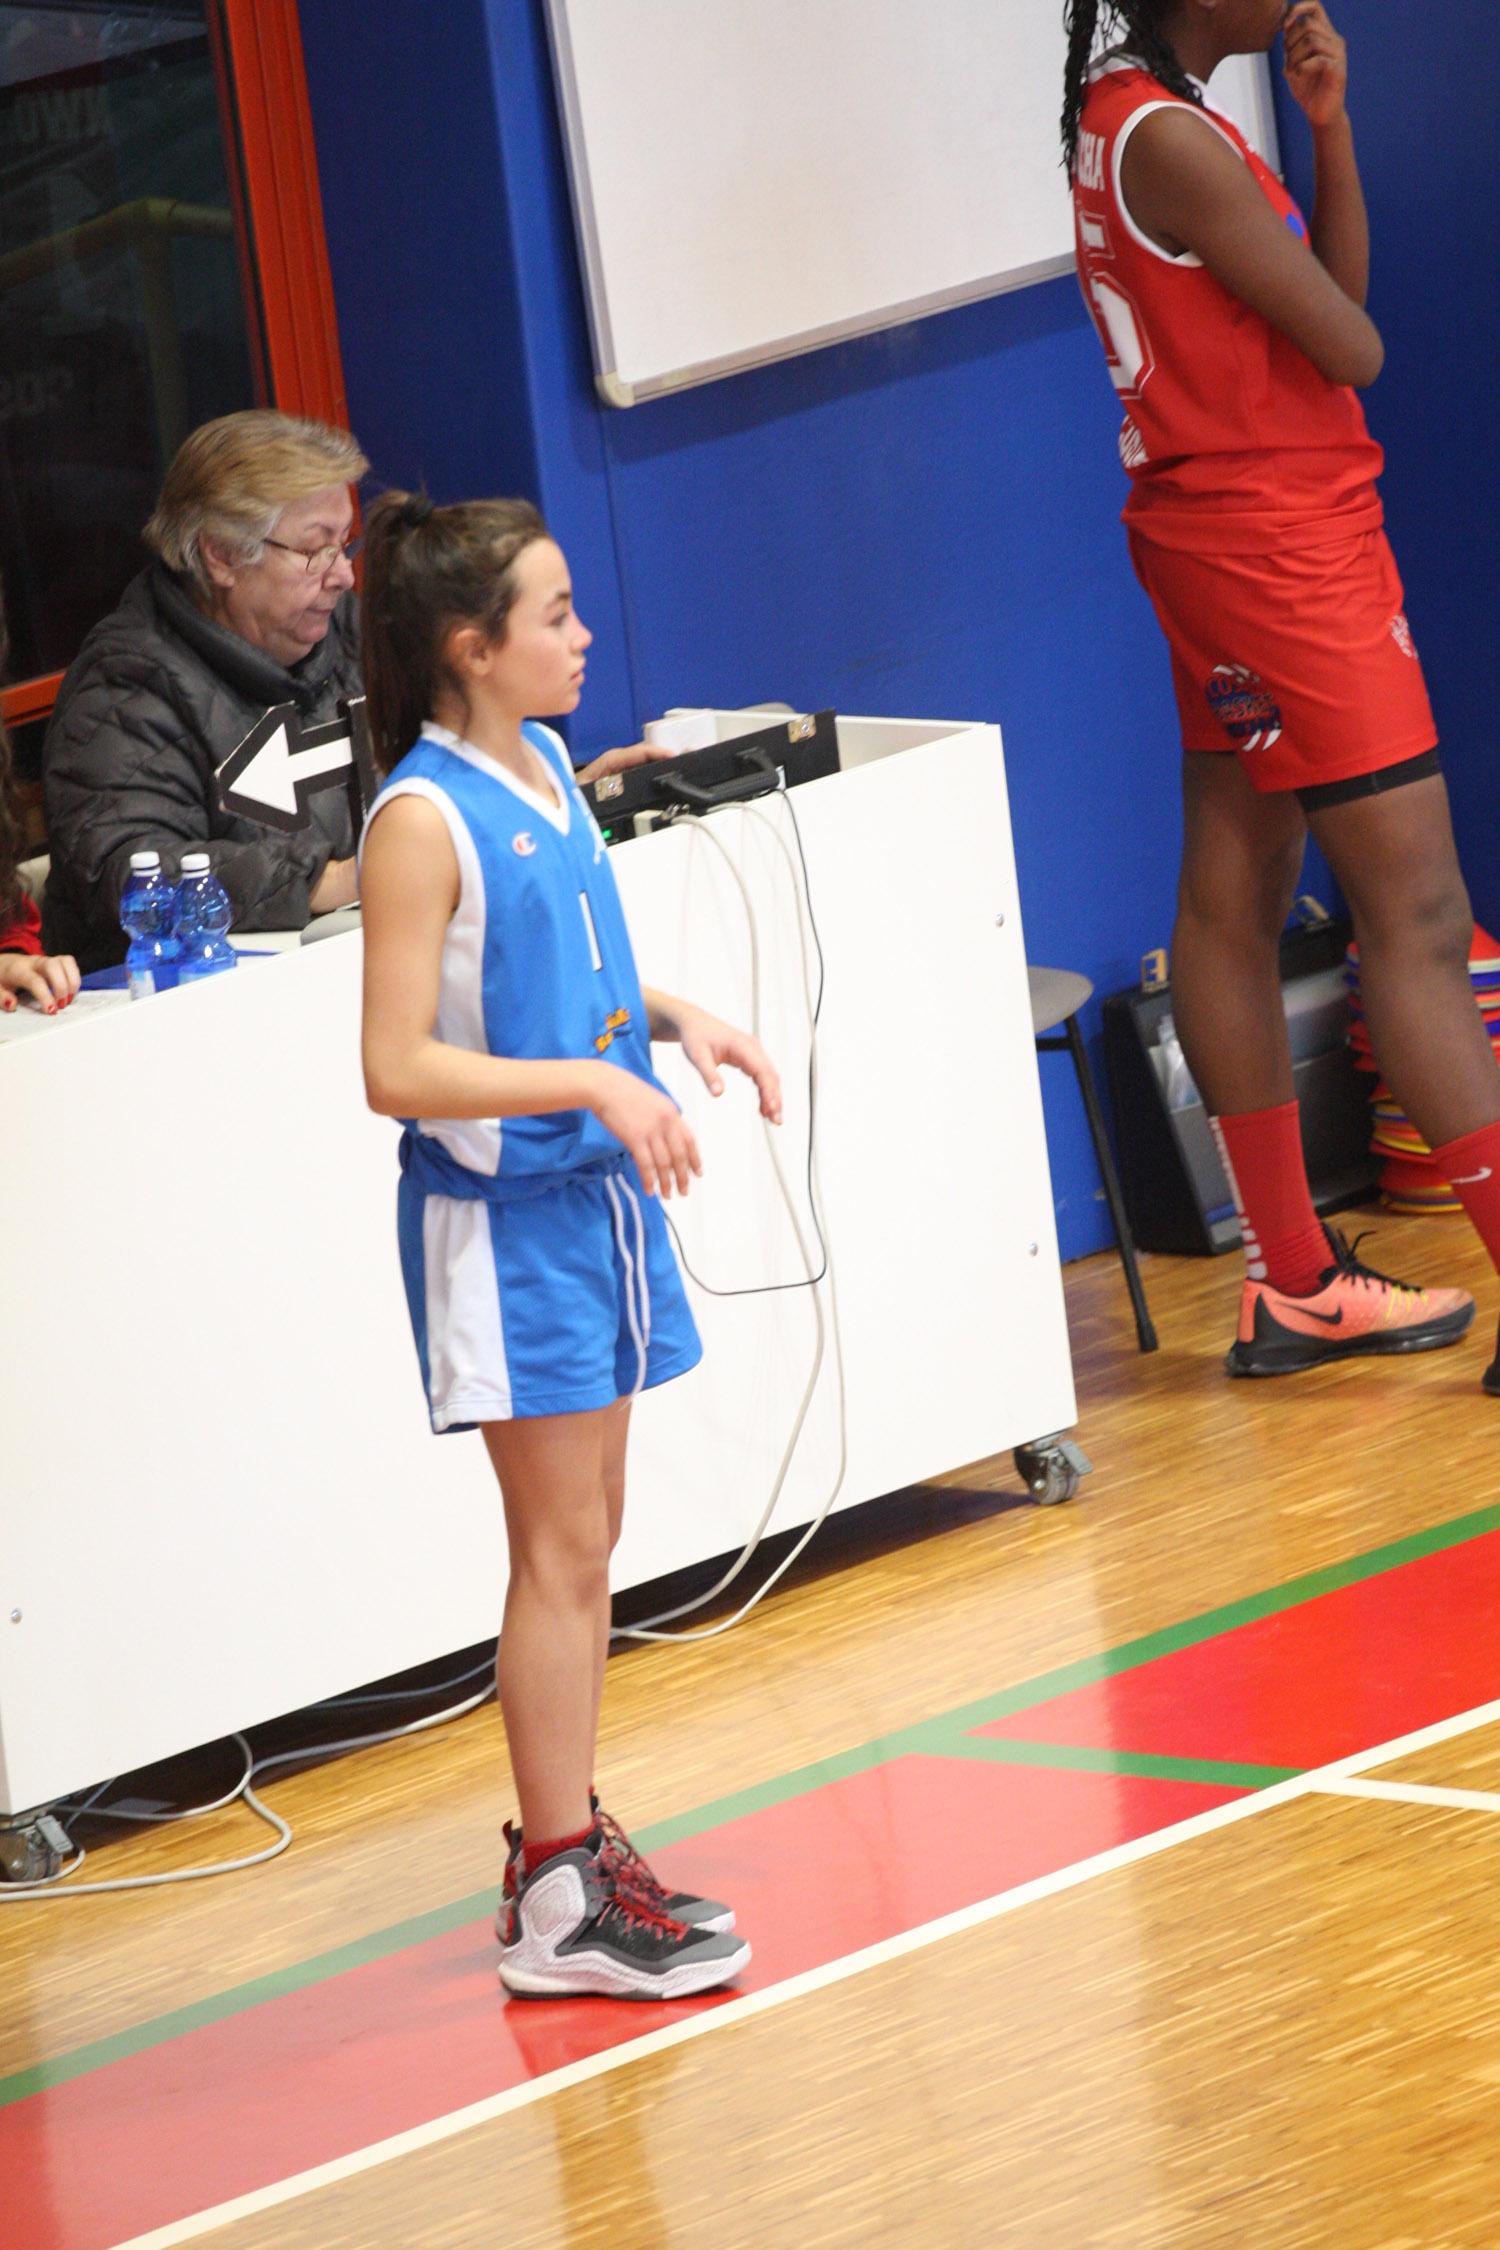 U16E - Costa Masnaga vs Baskettiamo Vittuone 2001 00031.jpg